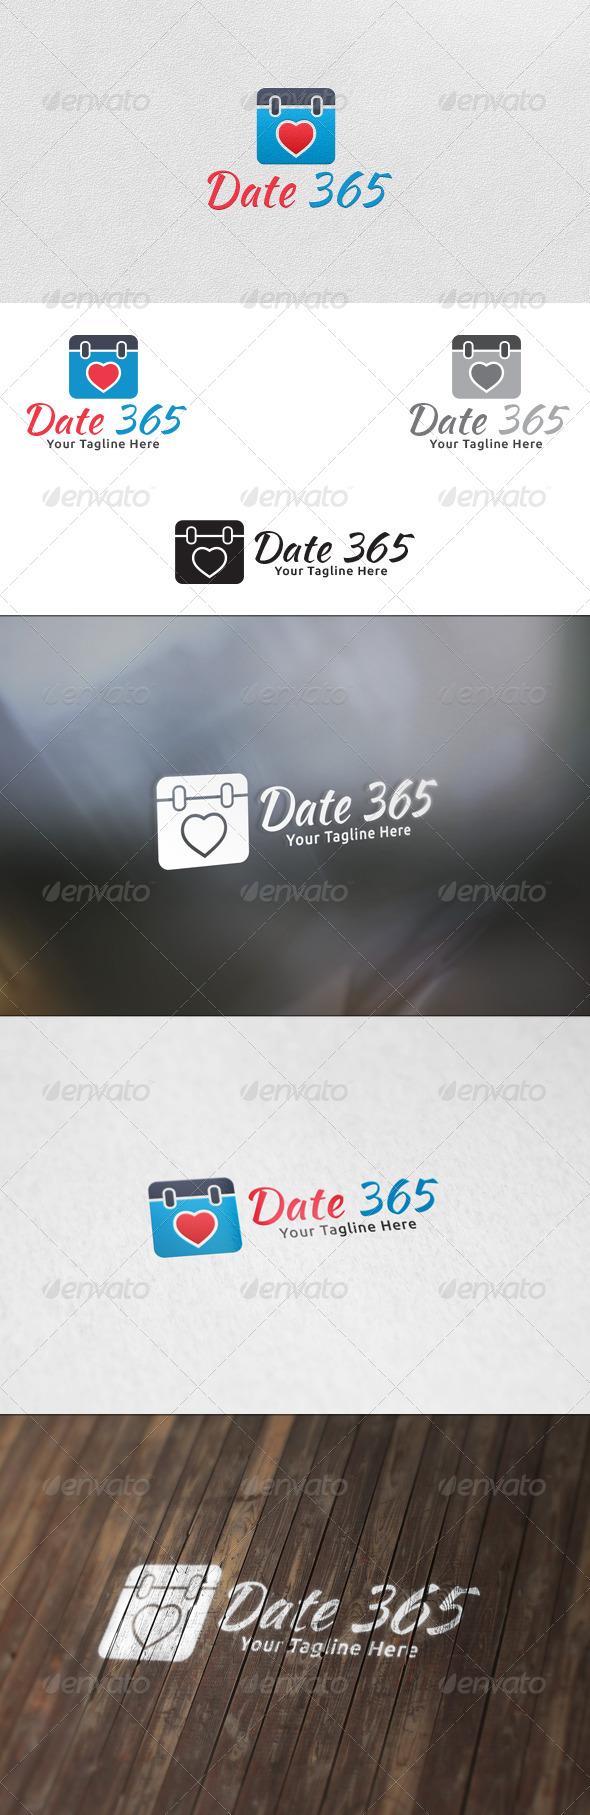 Date 365 Logo Template